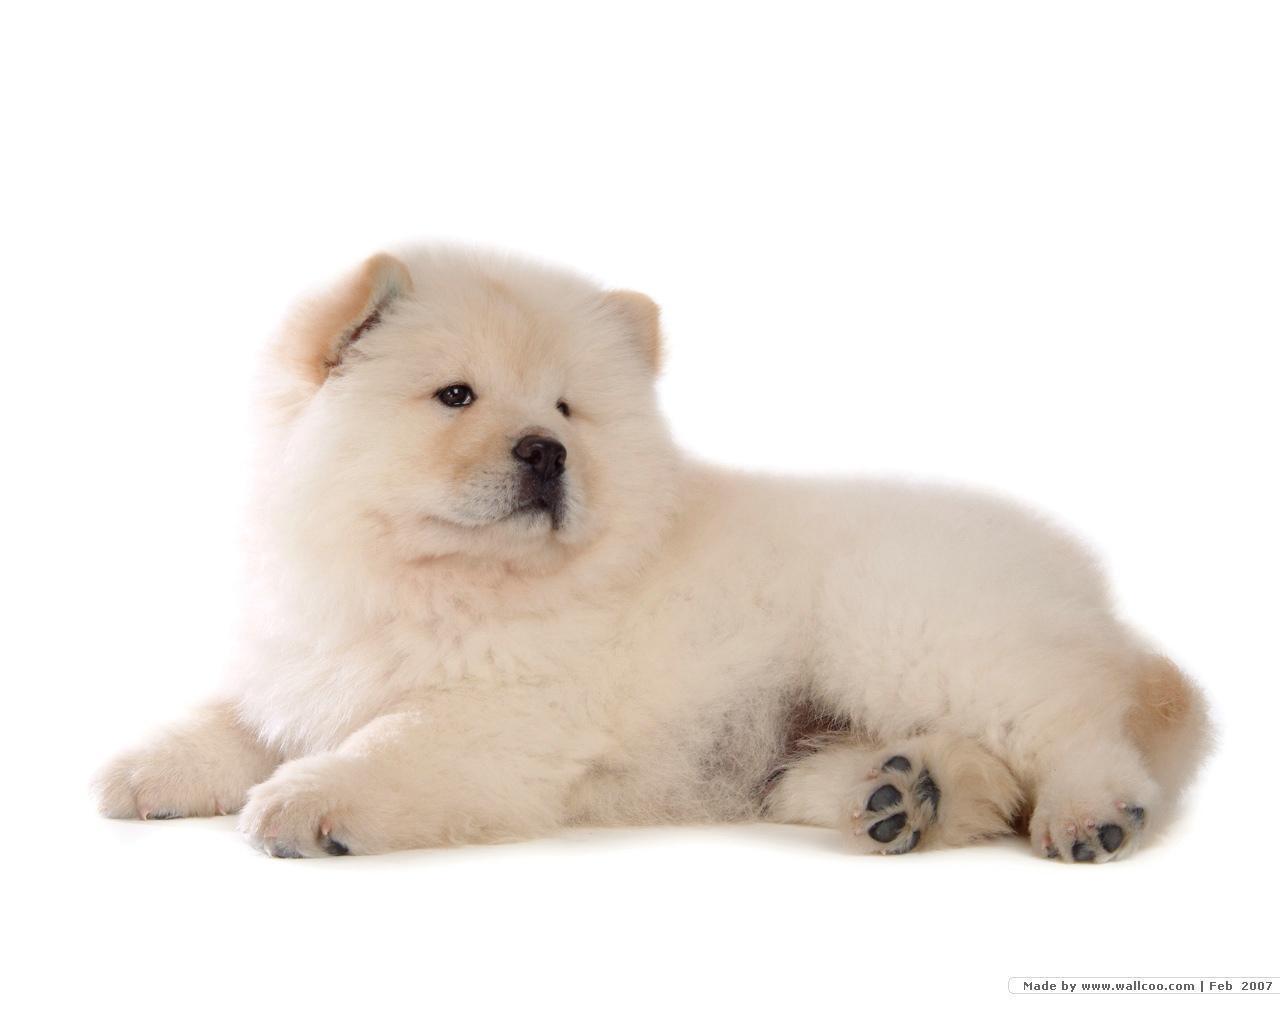 Chow Chow Wallpaper   Dogs Wallpaper 13936694 1280x1024